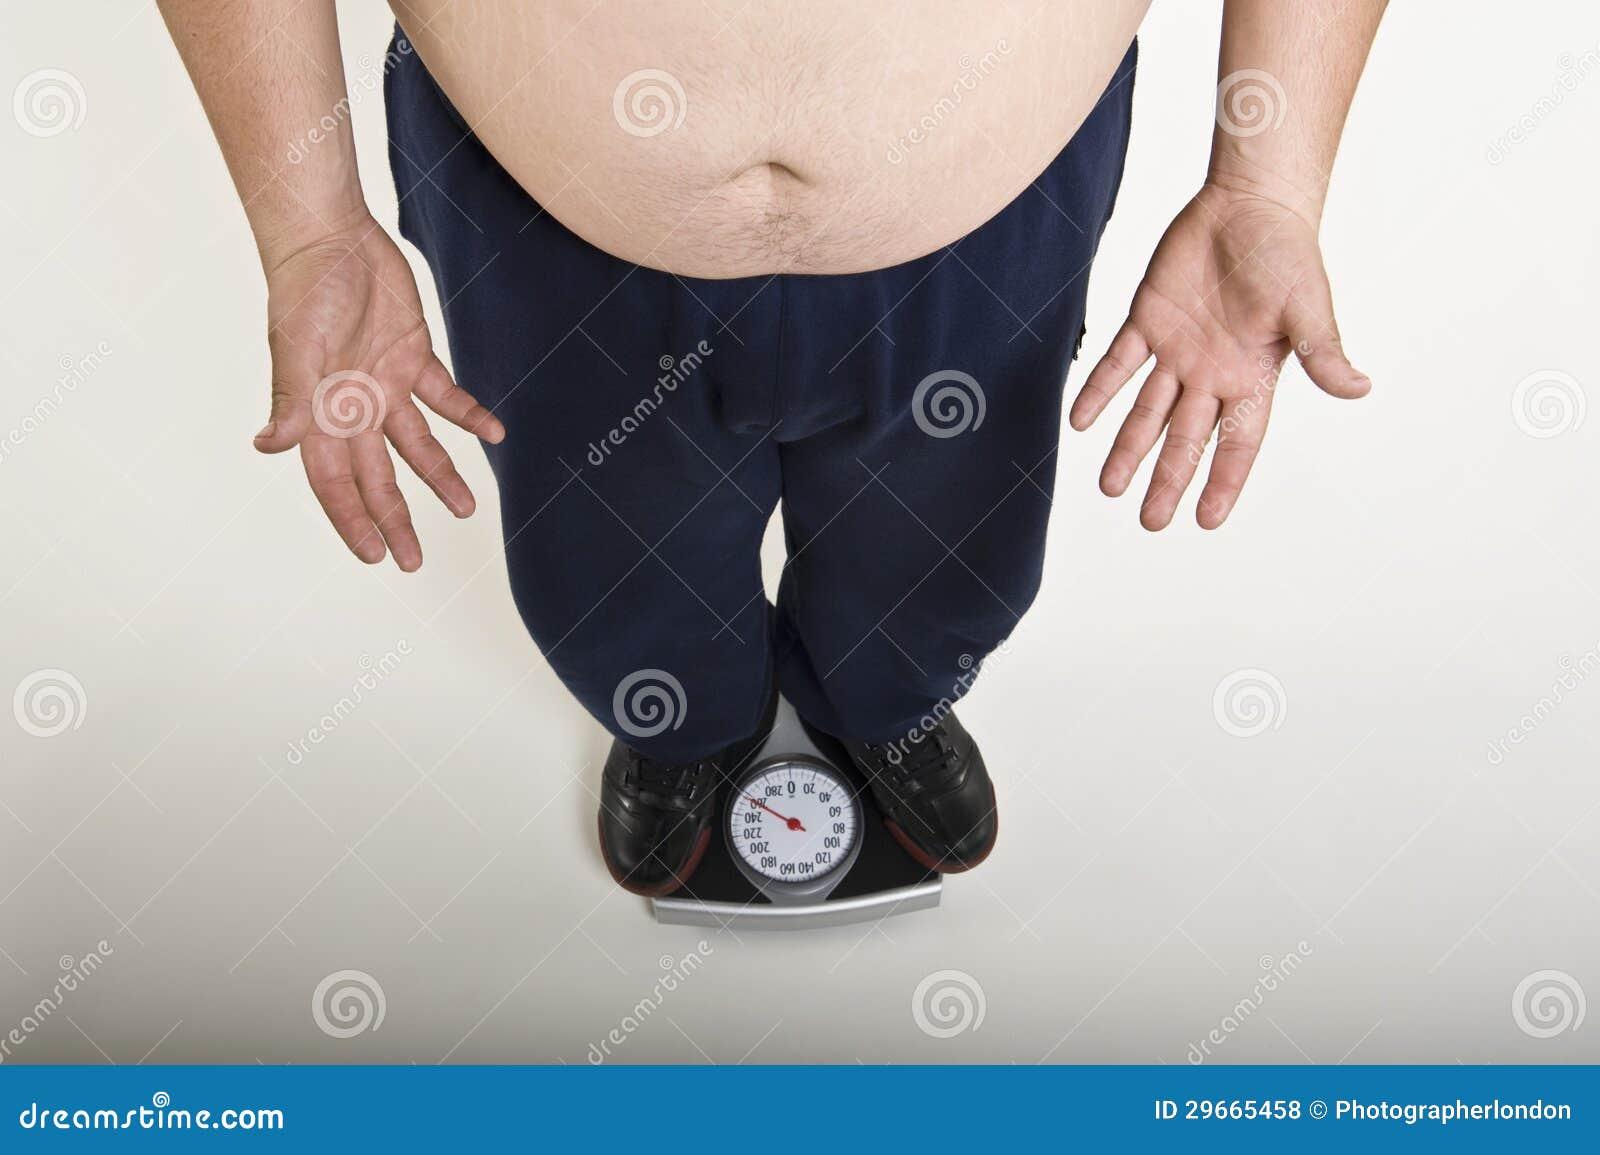 Man Measuring His Weight